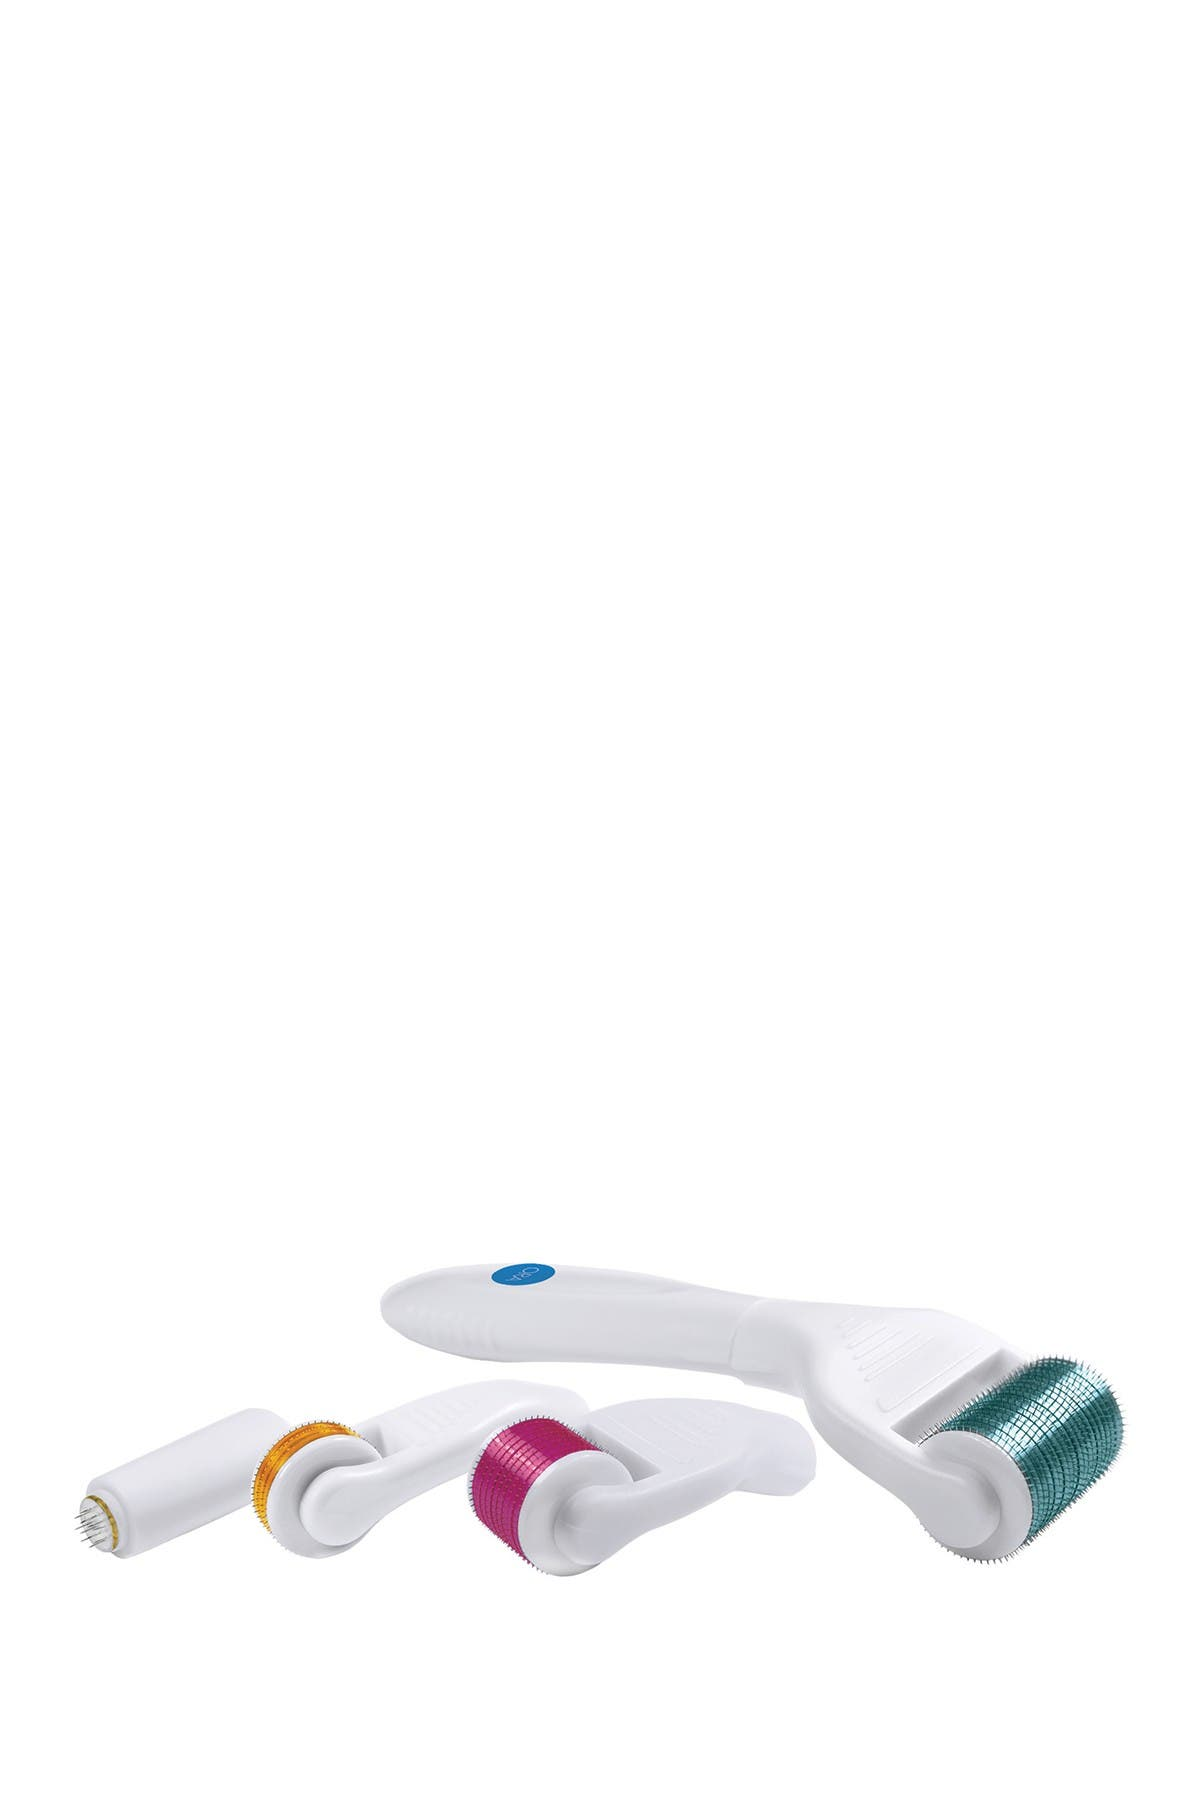 ORA Microneedle Face & Full Body Roller 6-Piece Kit